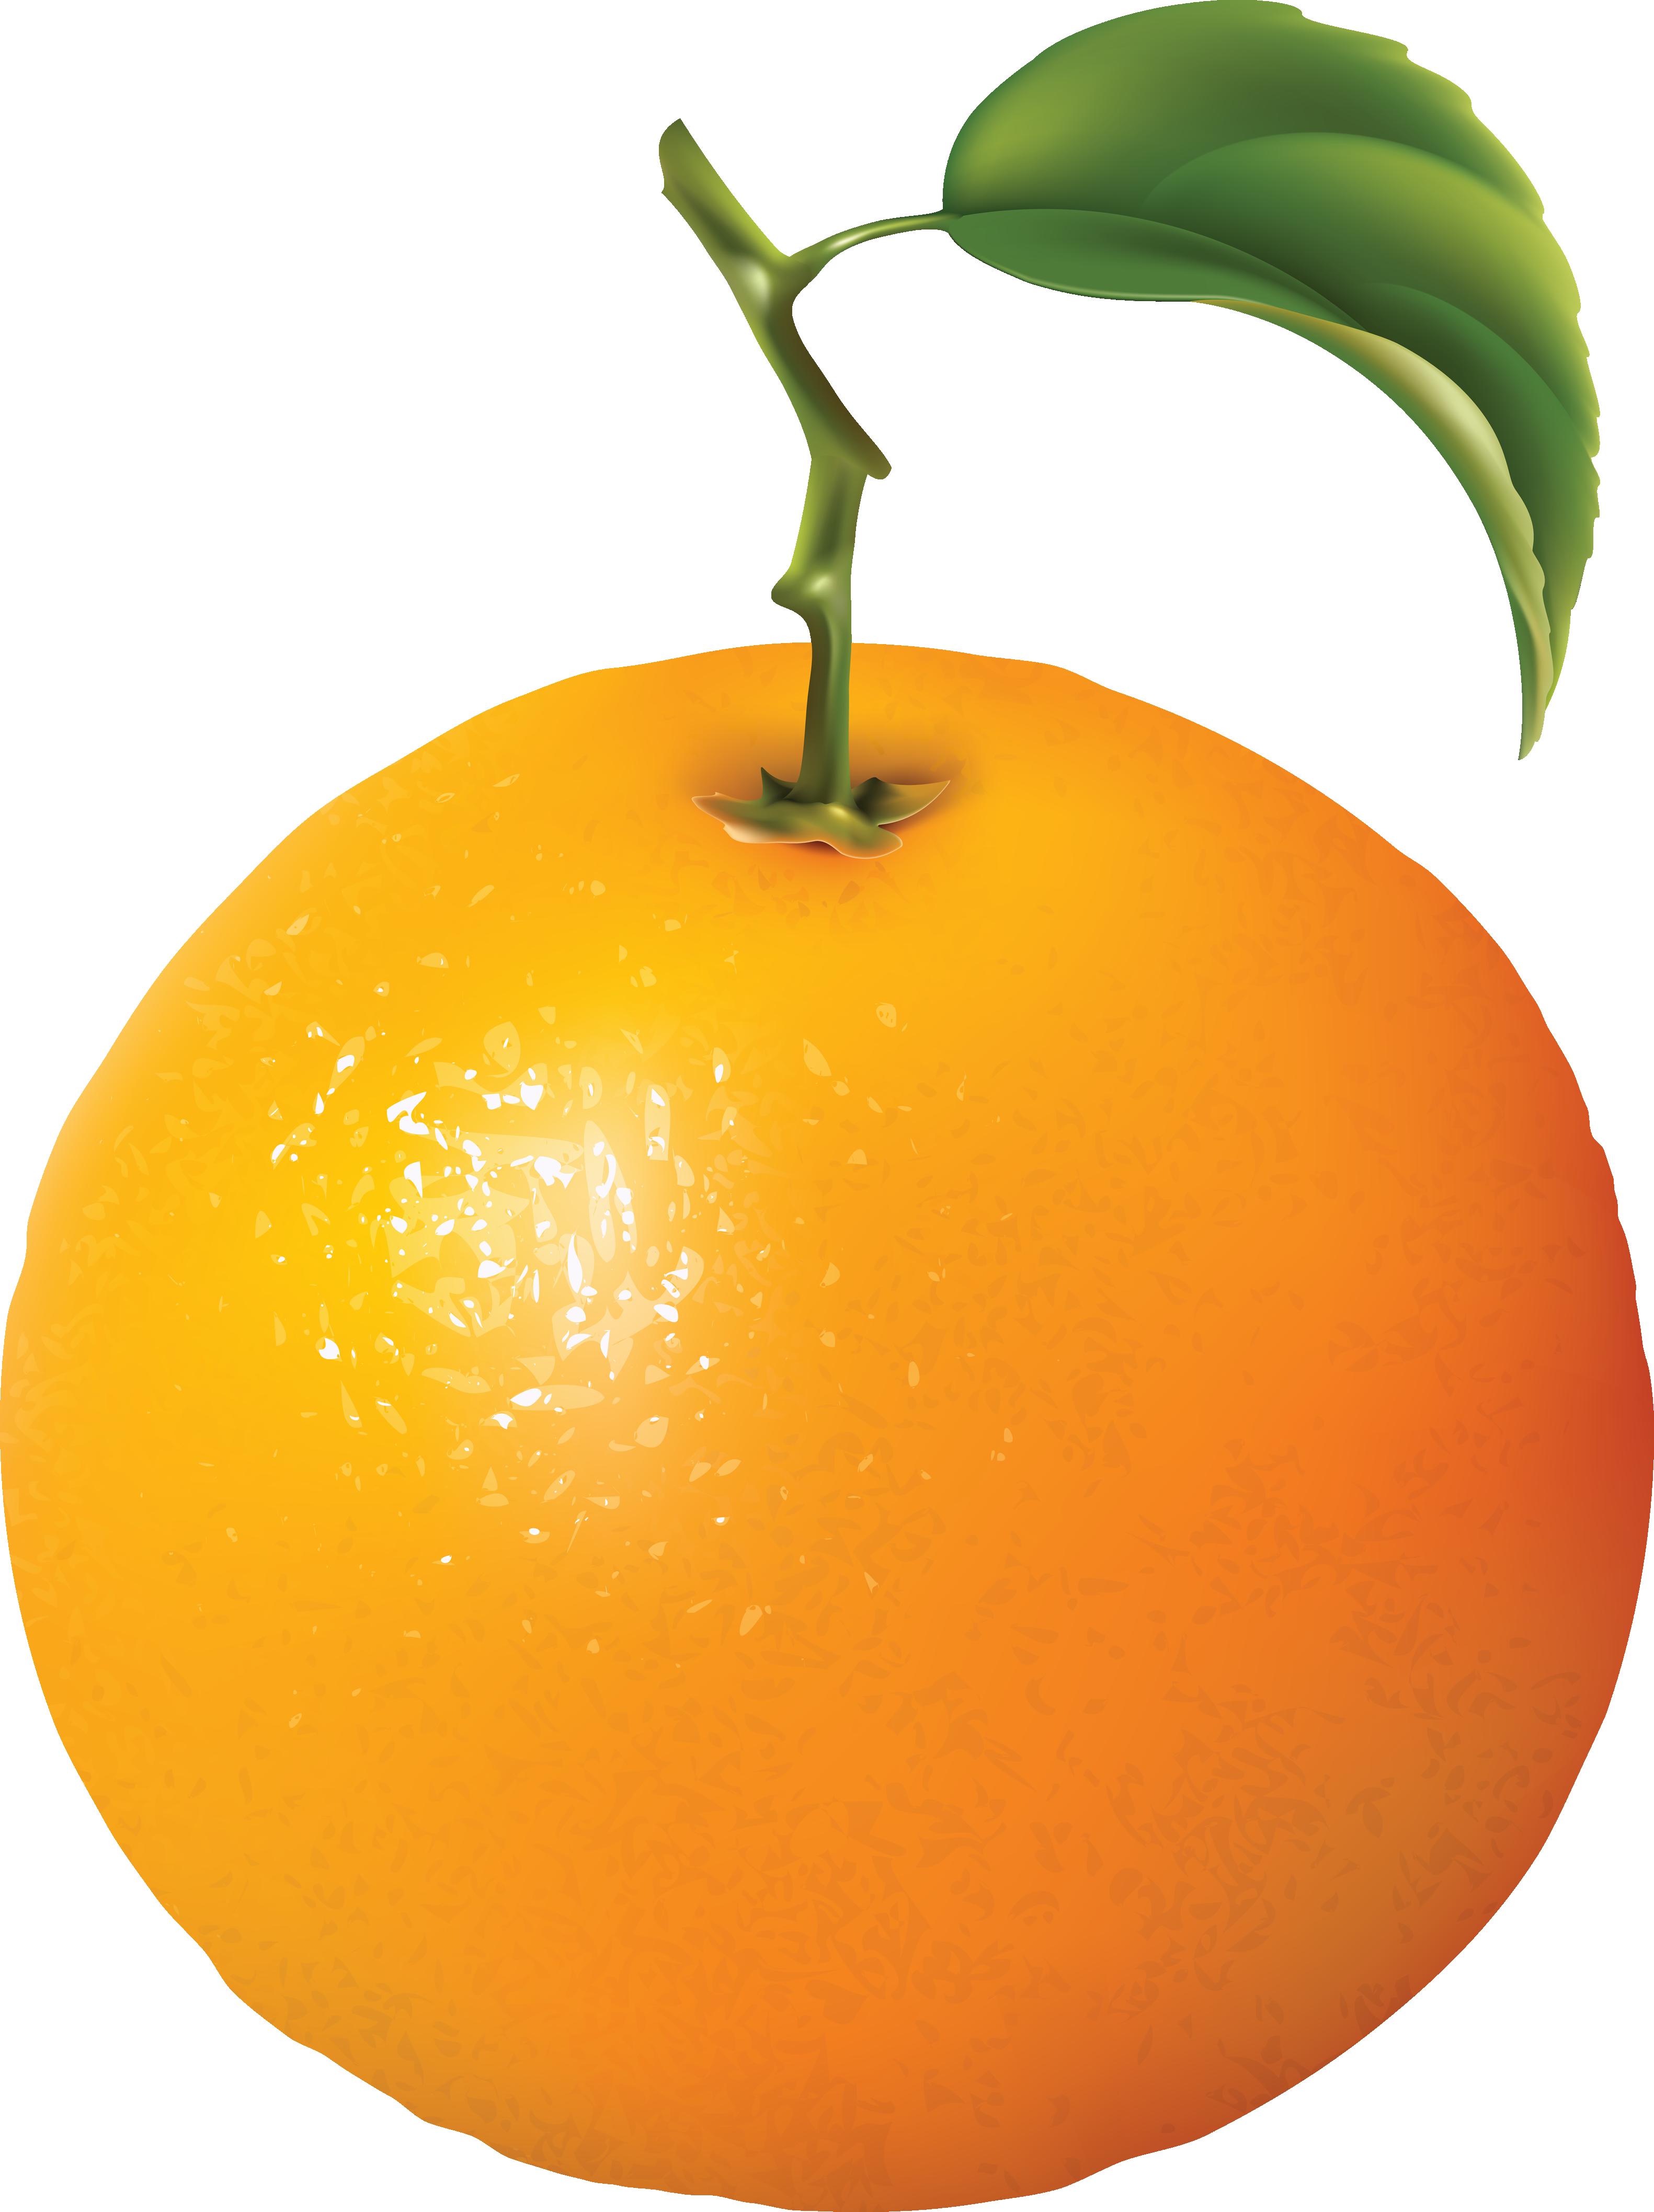 Pear clipart transparent background. Orange diagram clip art